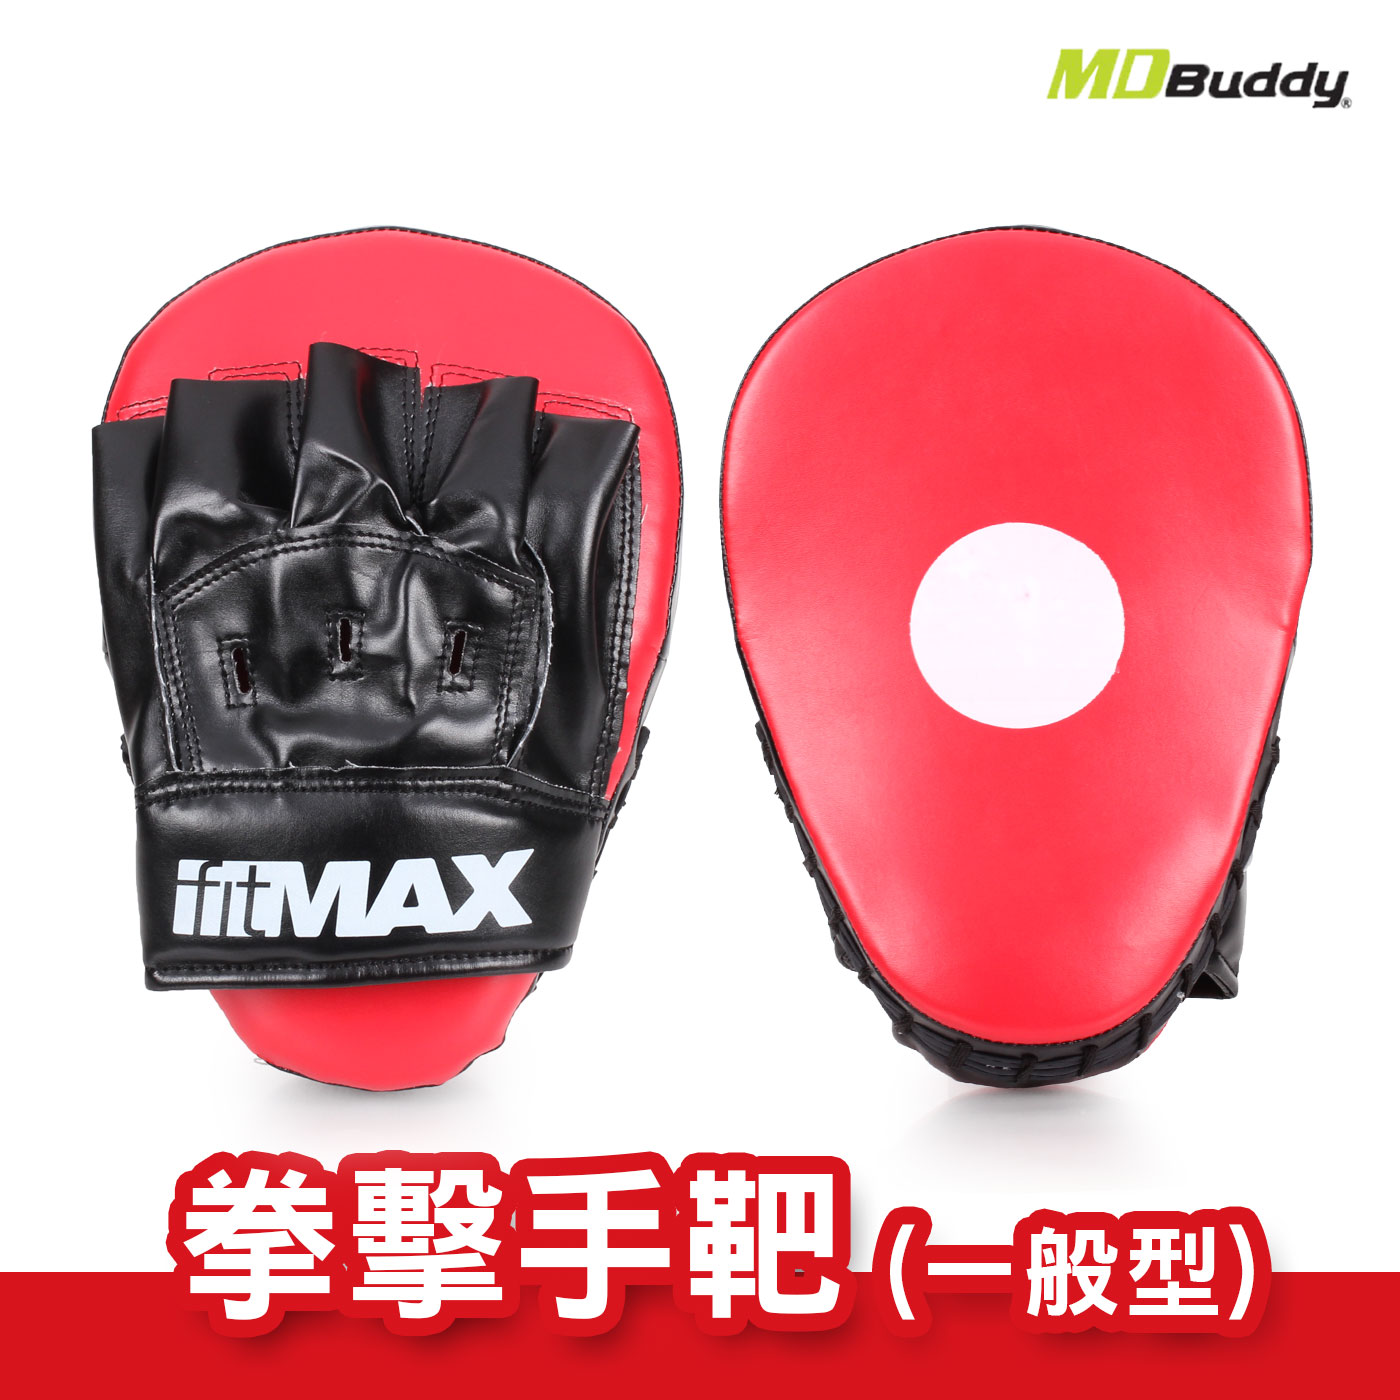 MDBuddy 拳擊手靶(一般型) 6025601